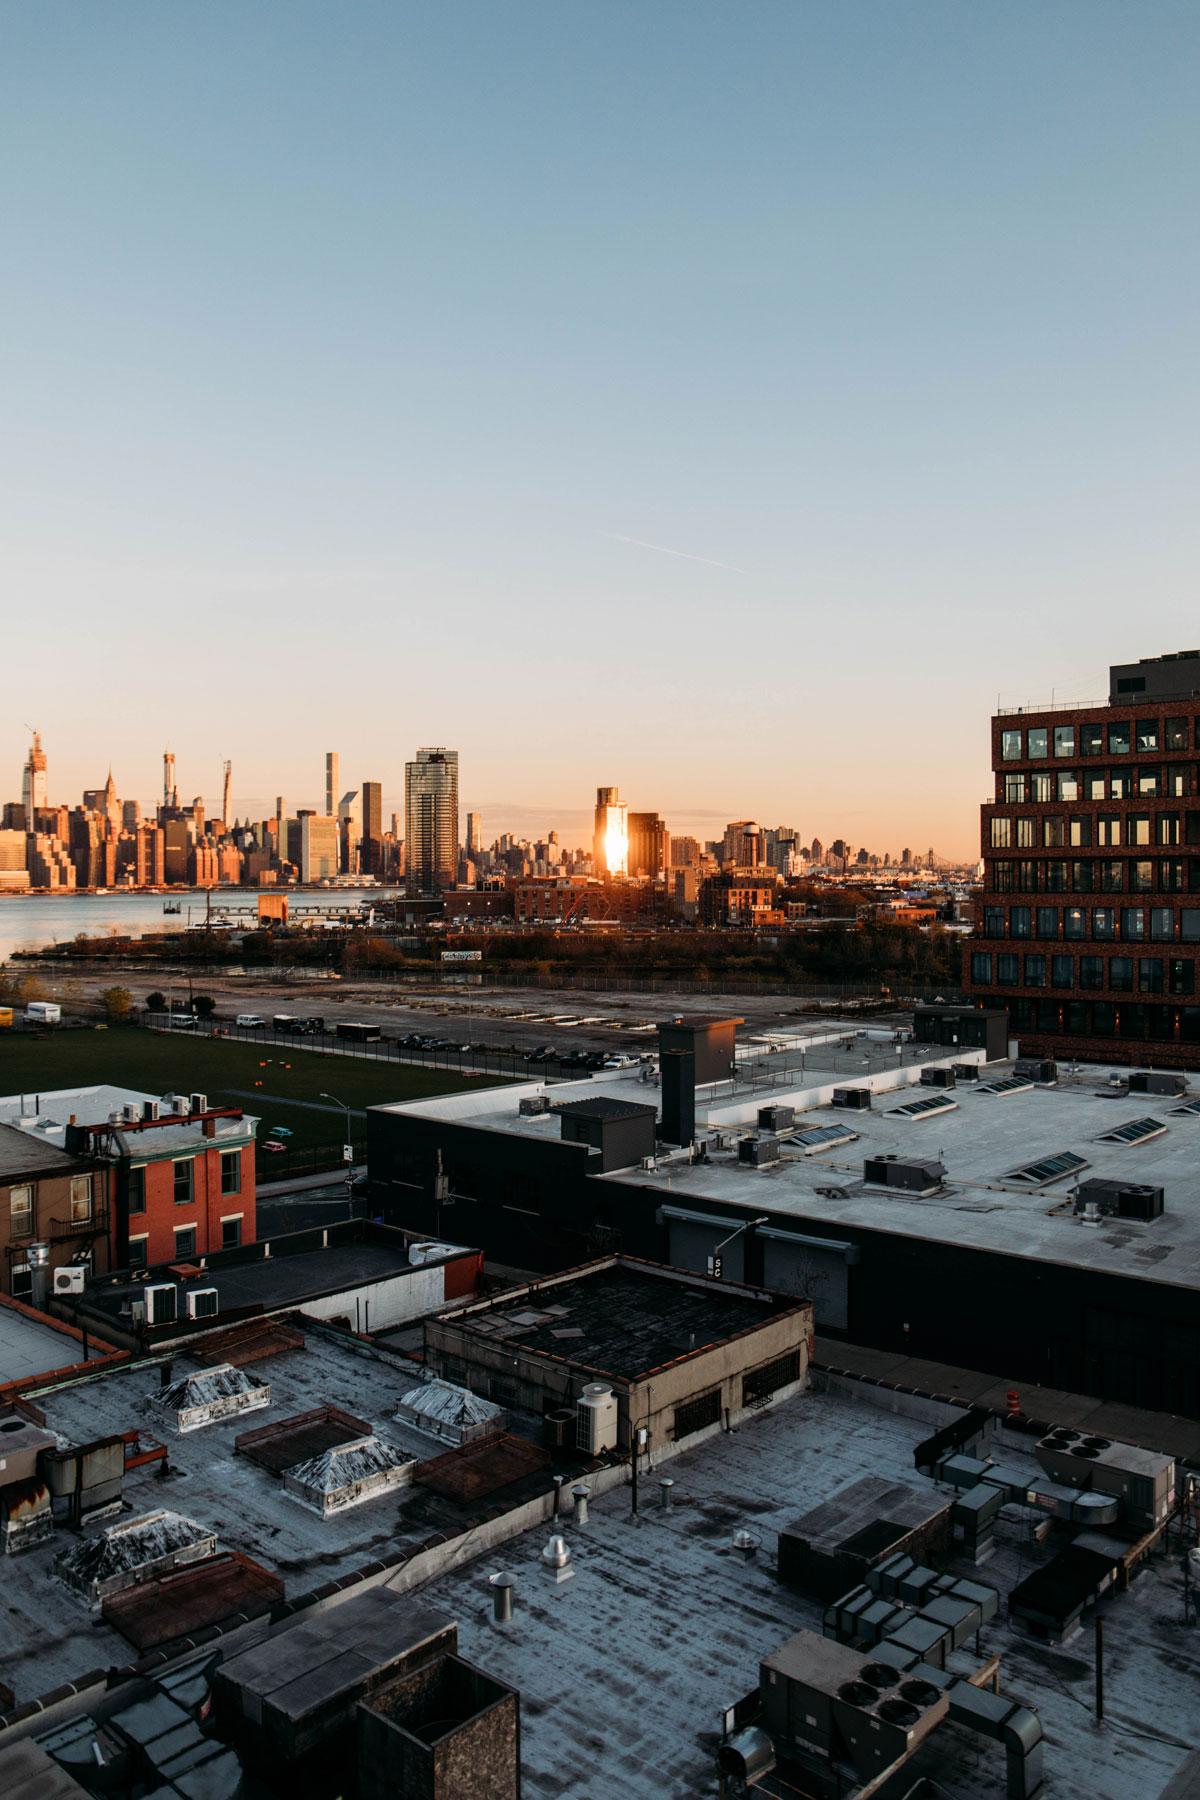 rooftop williamsburg new york